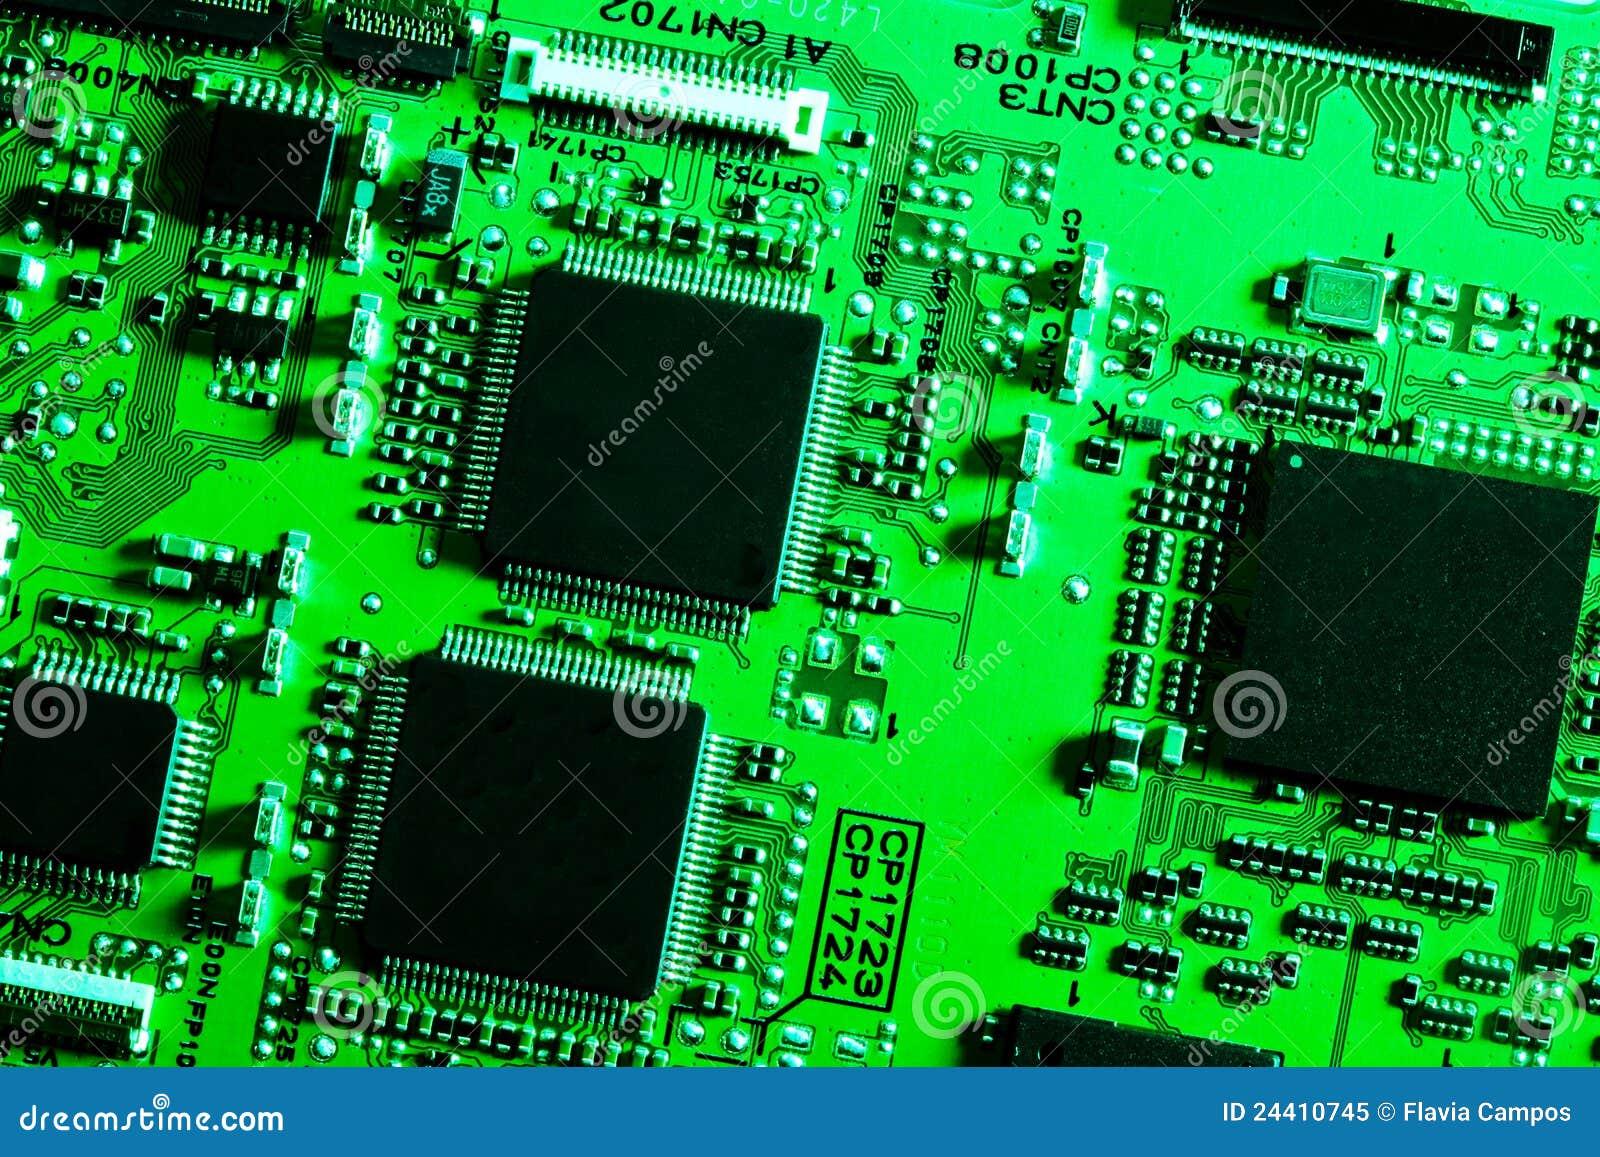 Circuito Electronico : Tarjeta de circuitos electrónicos imagen archivo